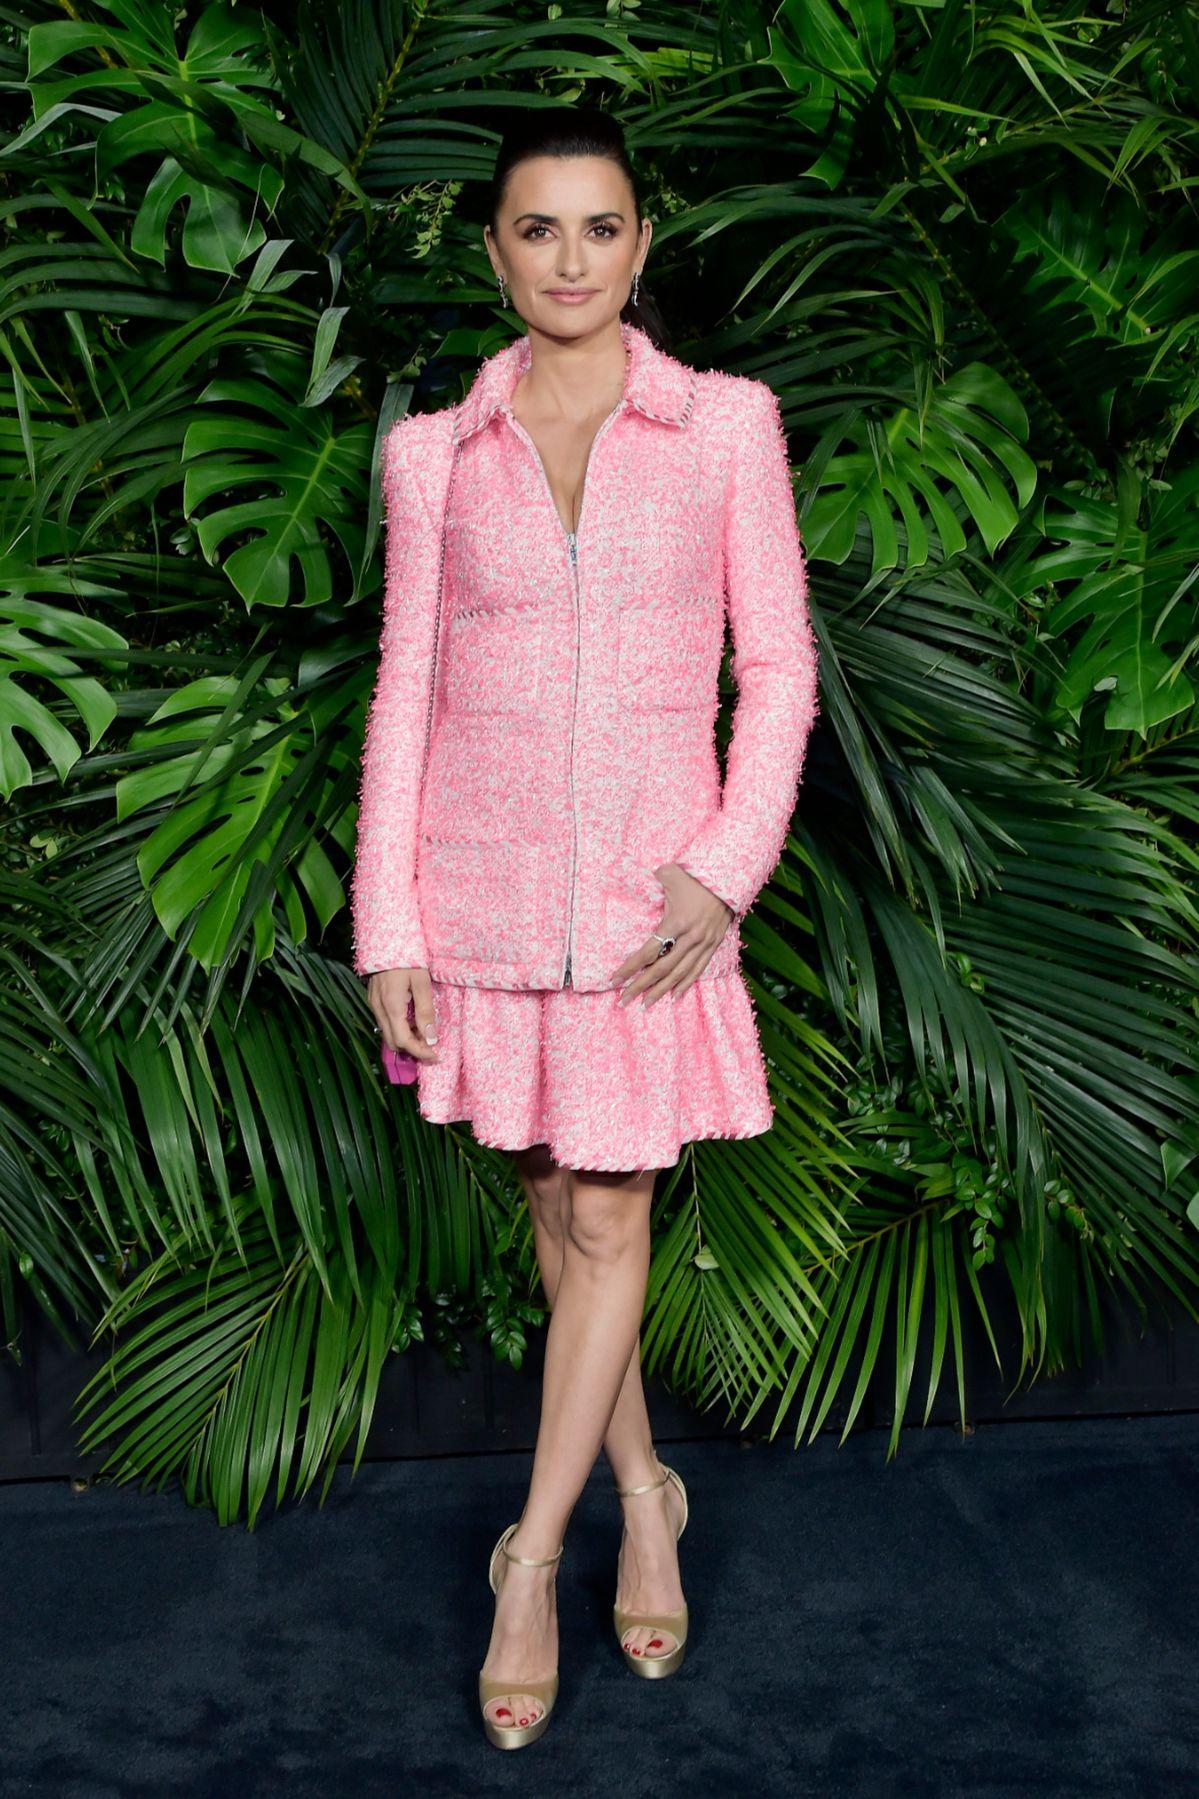 Penelope Cruz Wears Atelier Swarovski by Penelope Cruze Fine Jewelry Collection